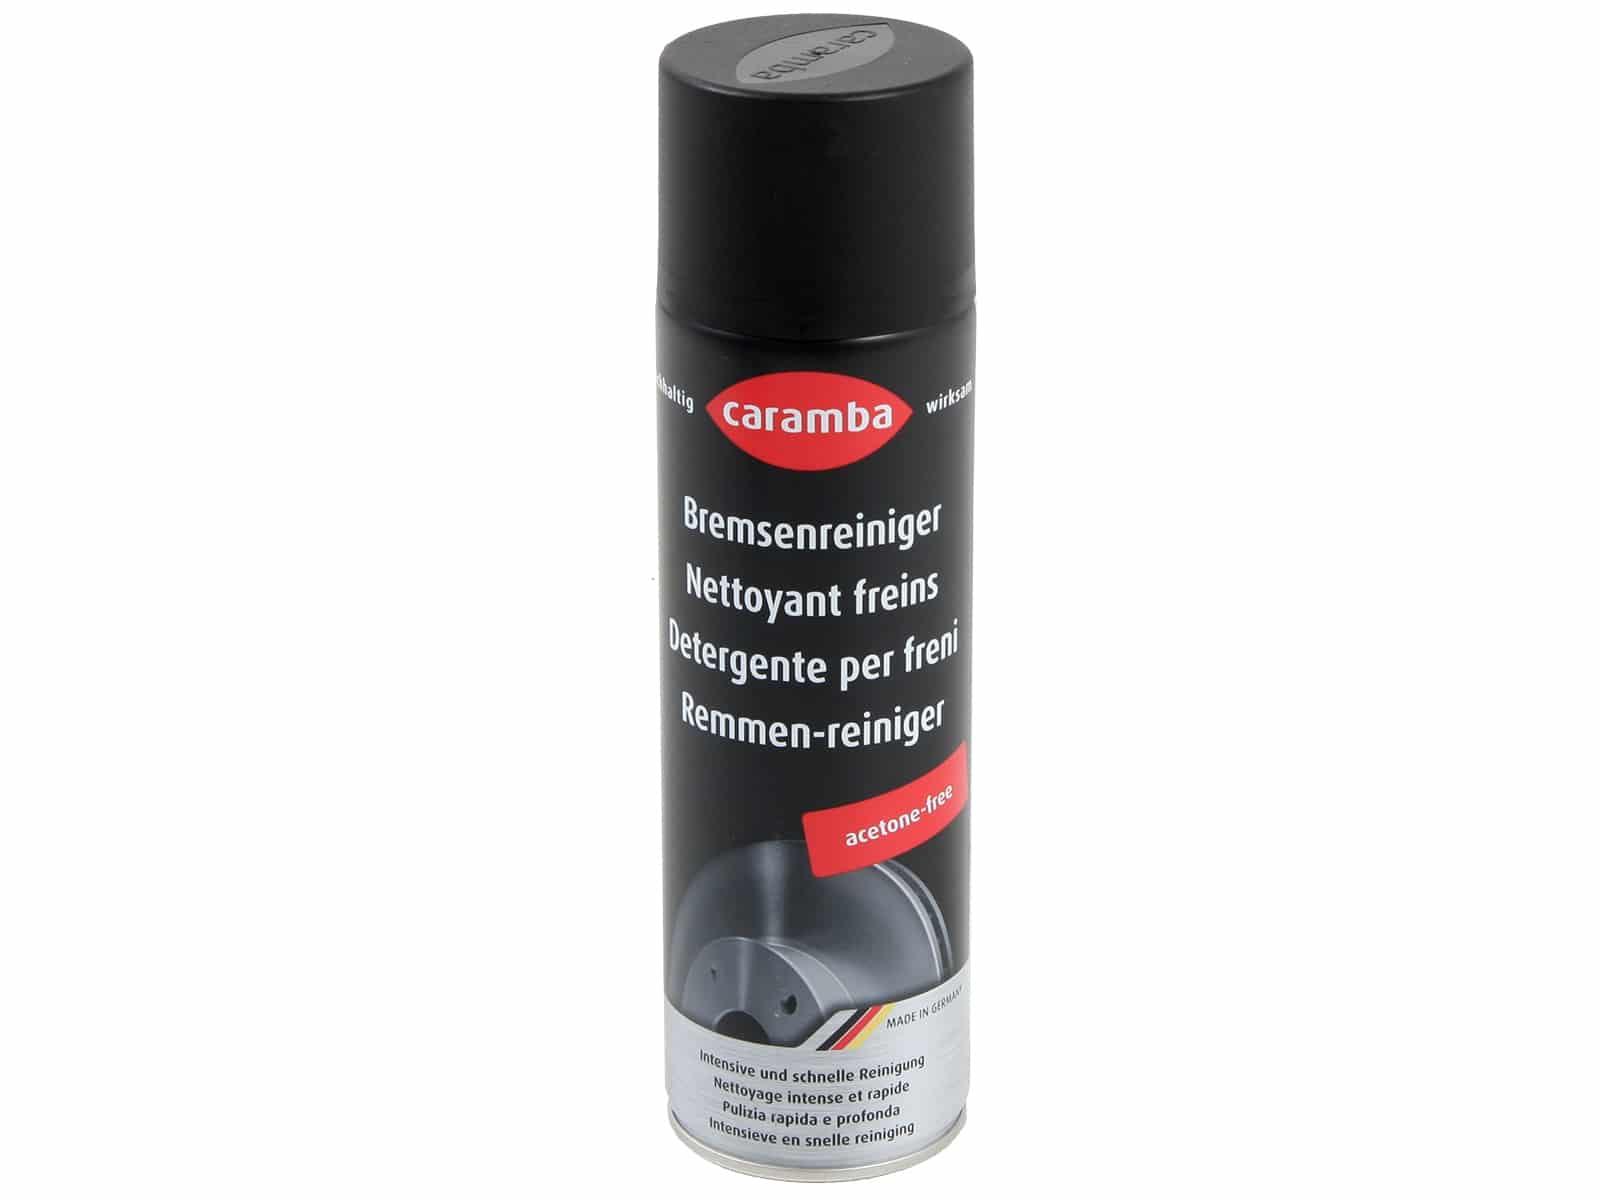 Caramba Bremsenreiniger Spraydose 500ml